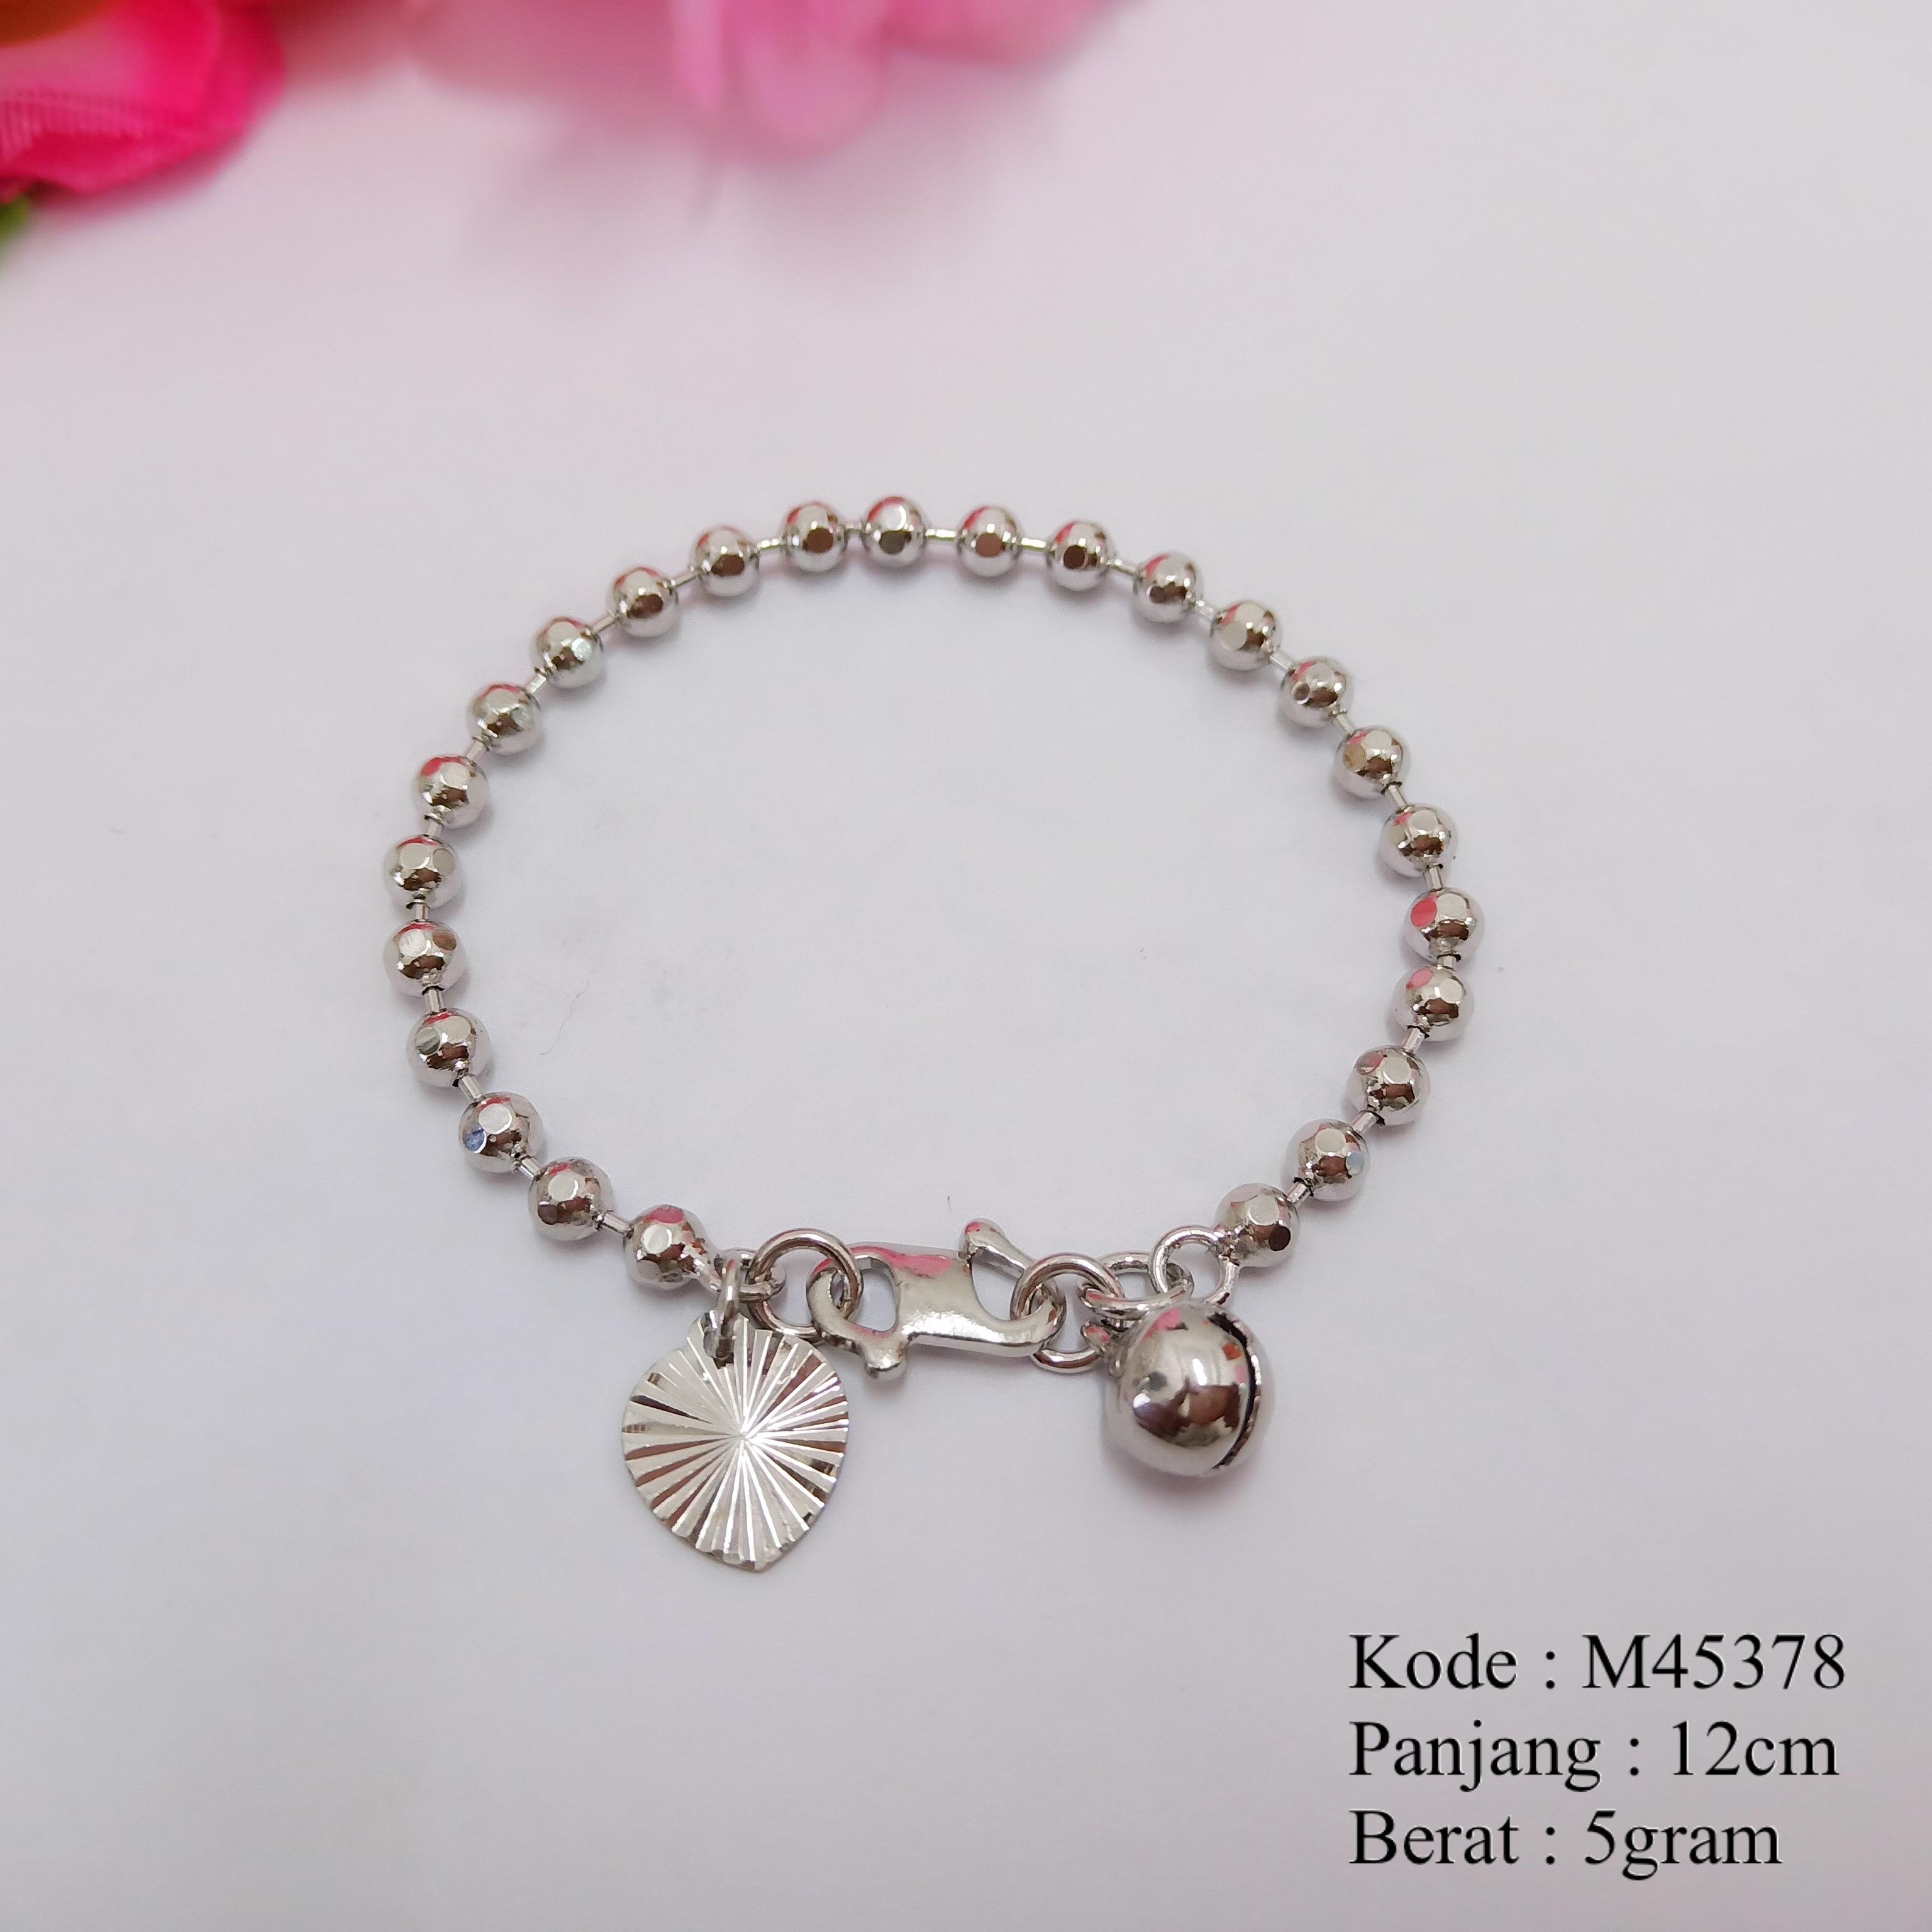 [BAYAR DITEMPAT] Gelang Tangan Anak Bayi Lapis Emas Perhiasan Anak Cantik Xuping Missi M45378